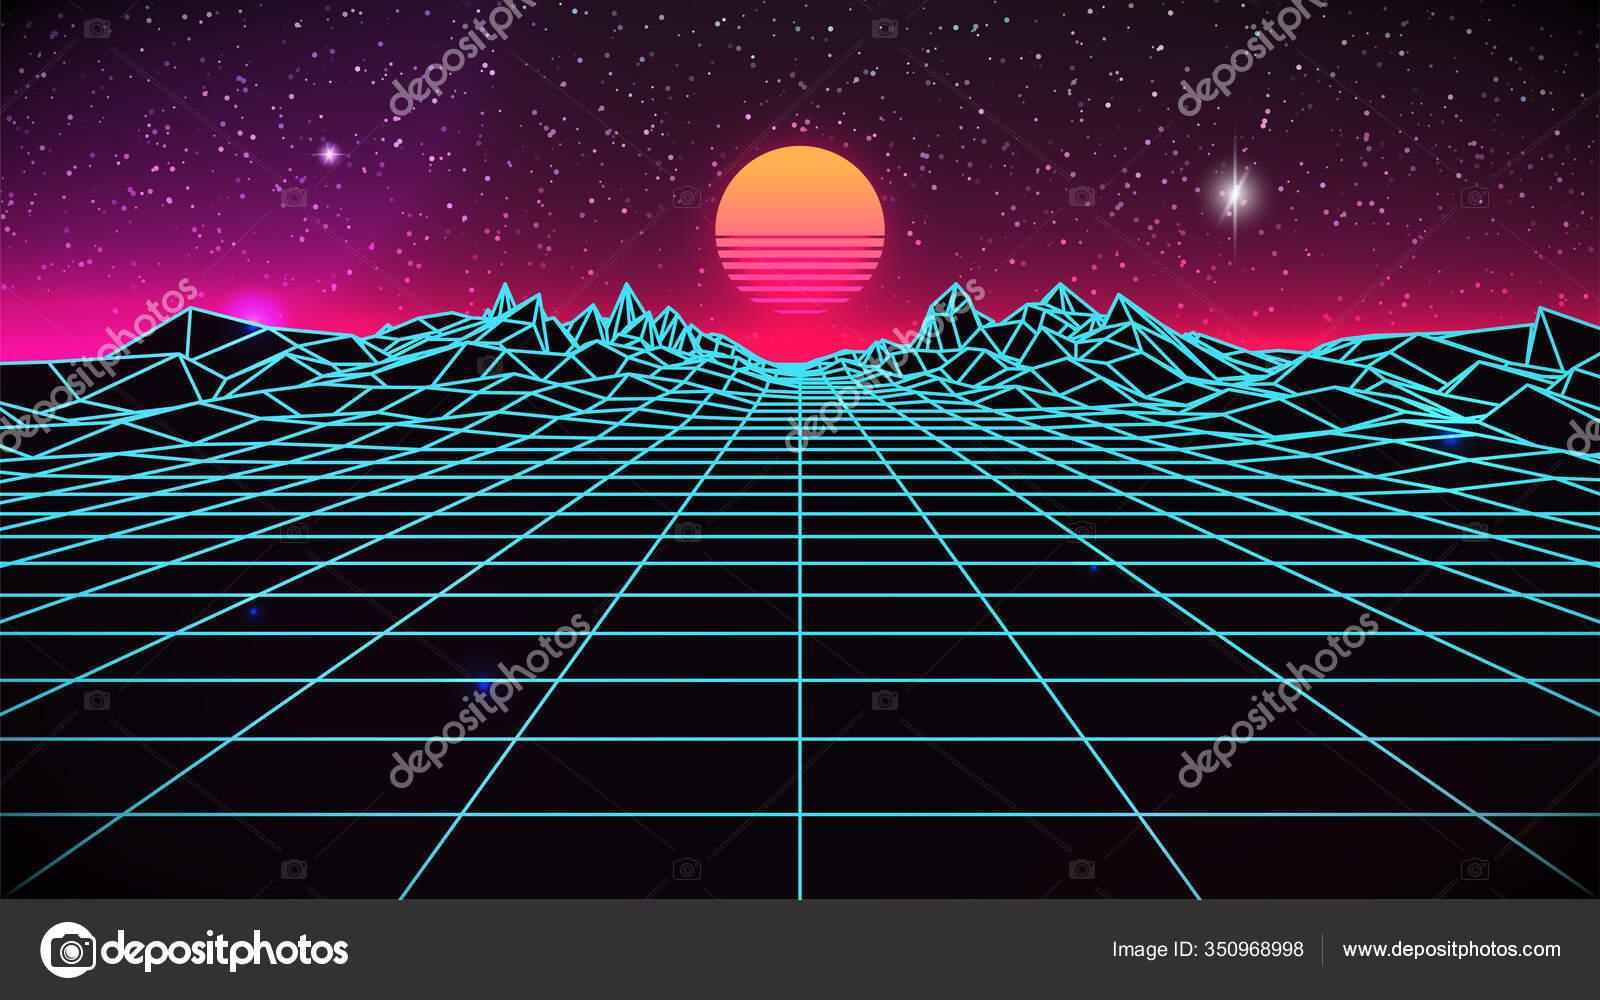 depositphotos 350968998 stock illustration synthwave sunset background 80s sun